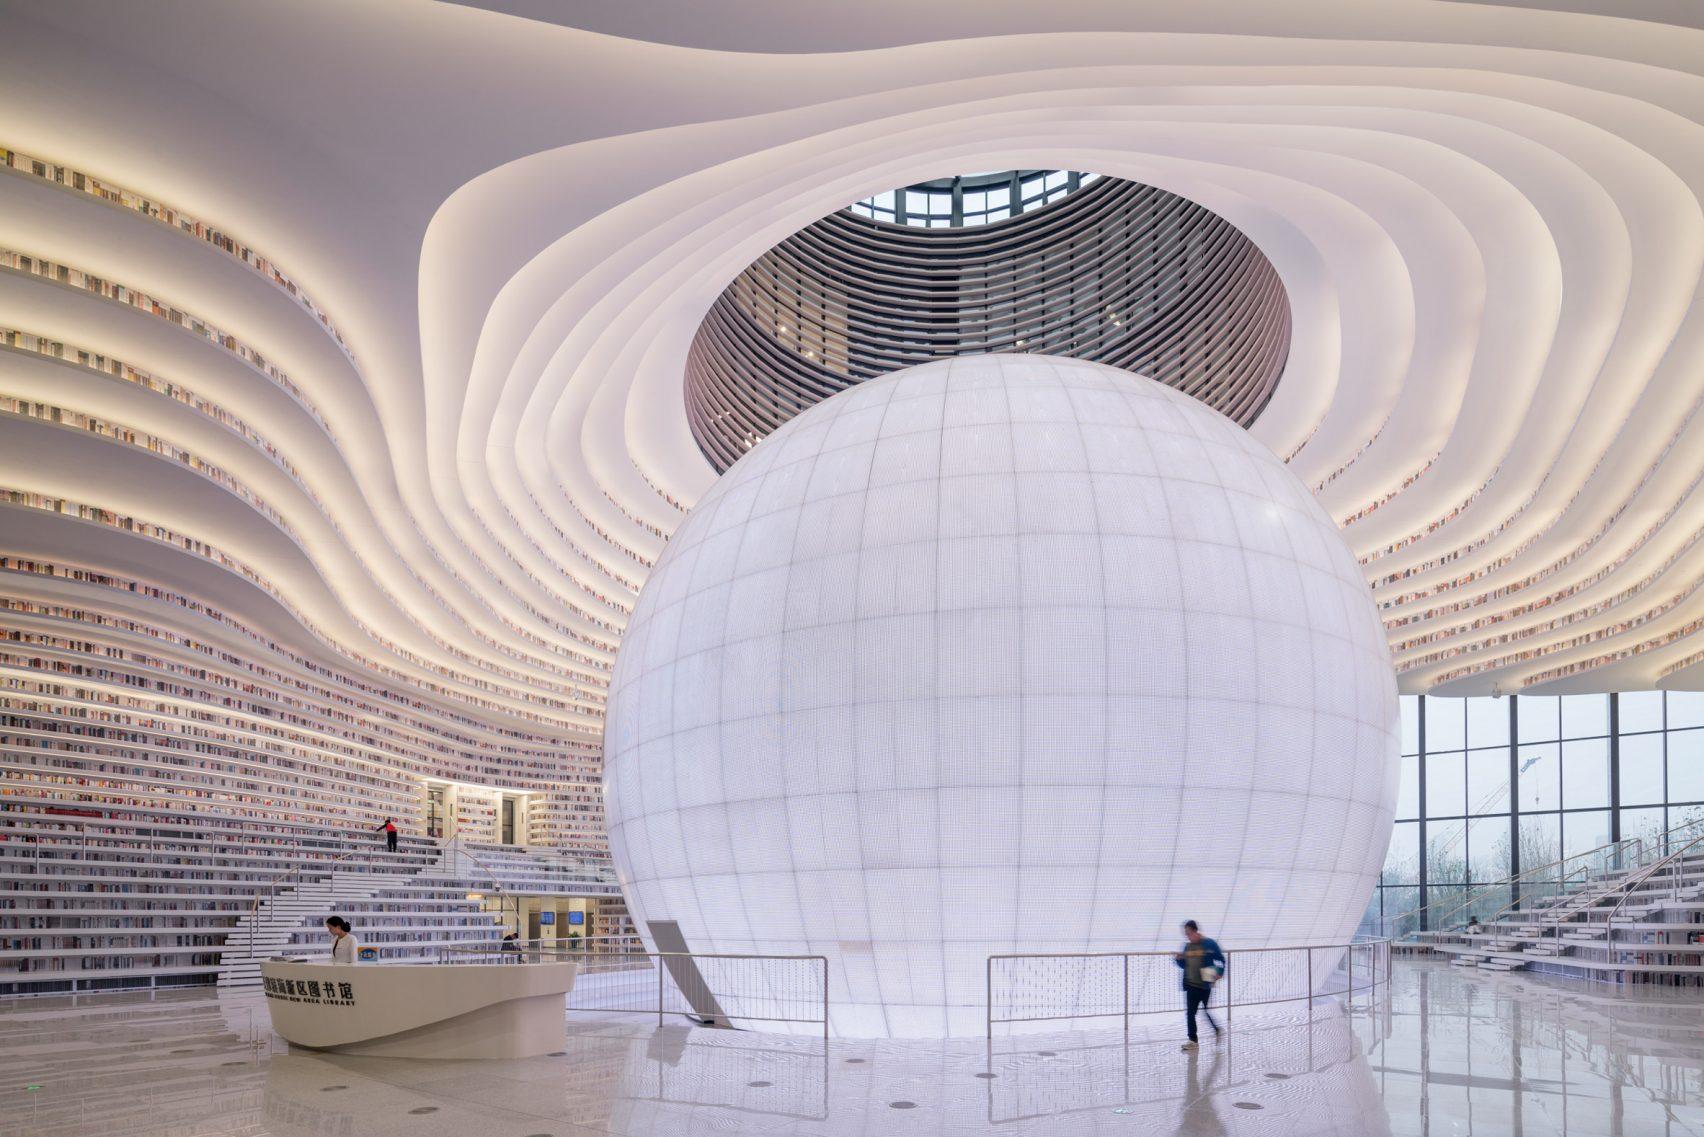 tianjin-binhai-library-mvrdv-architecture-public-and-leisure-china_dezeen_2364_col_11-1704x1137.jpg